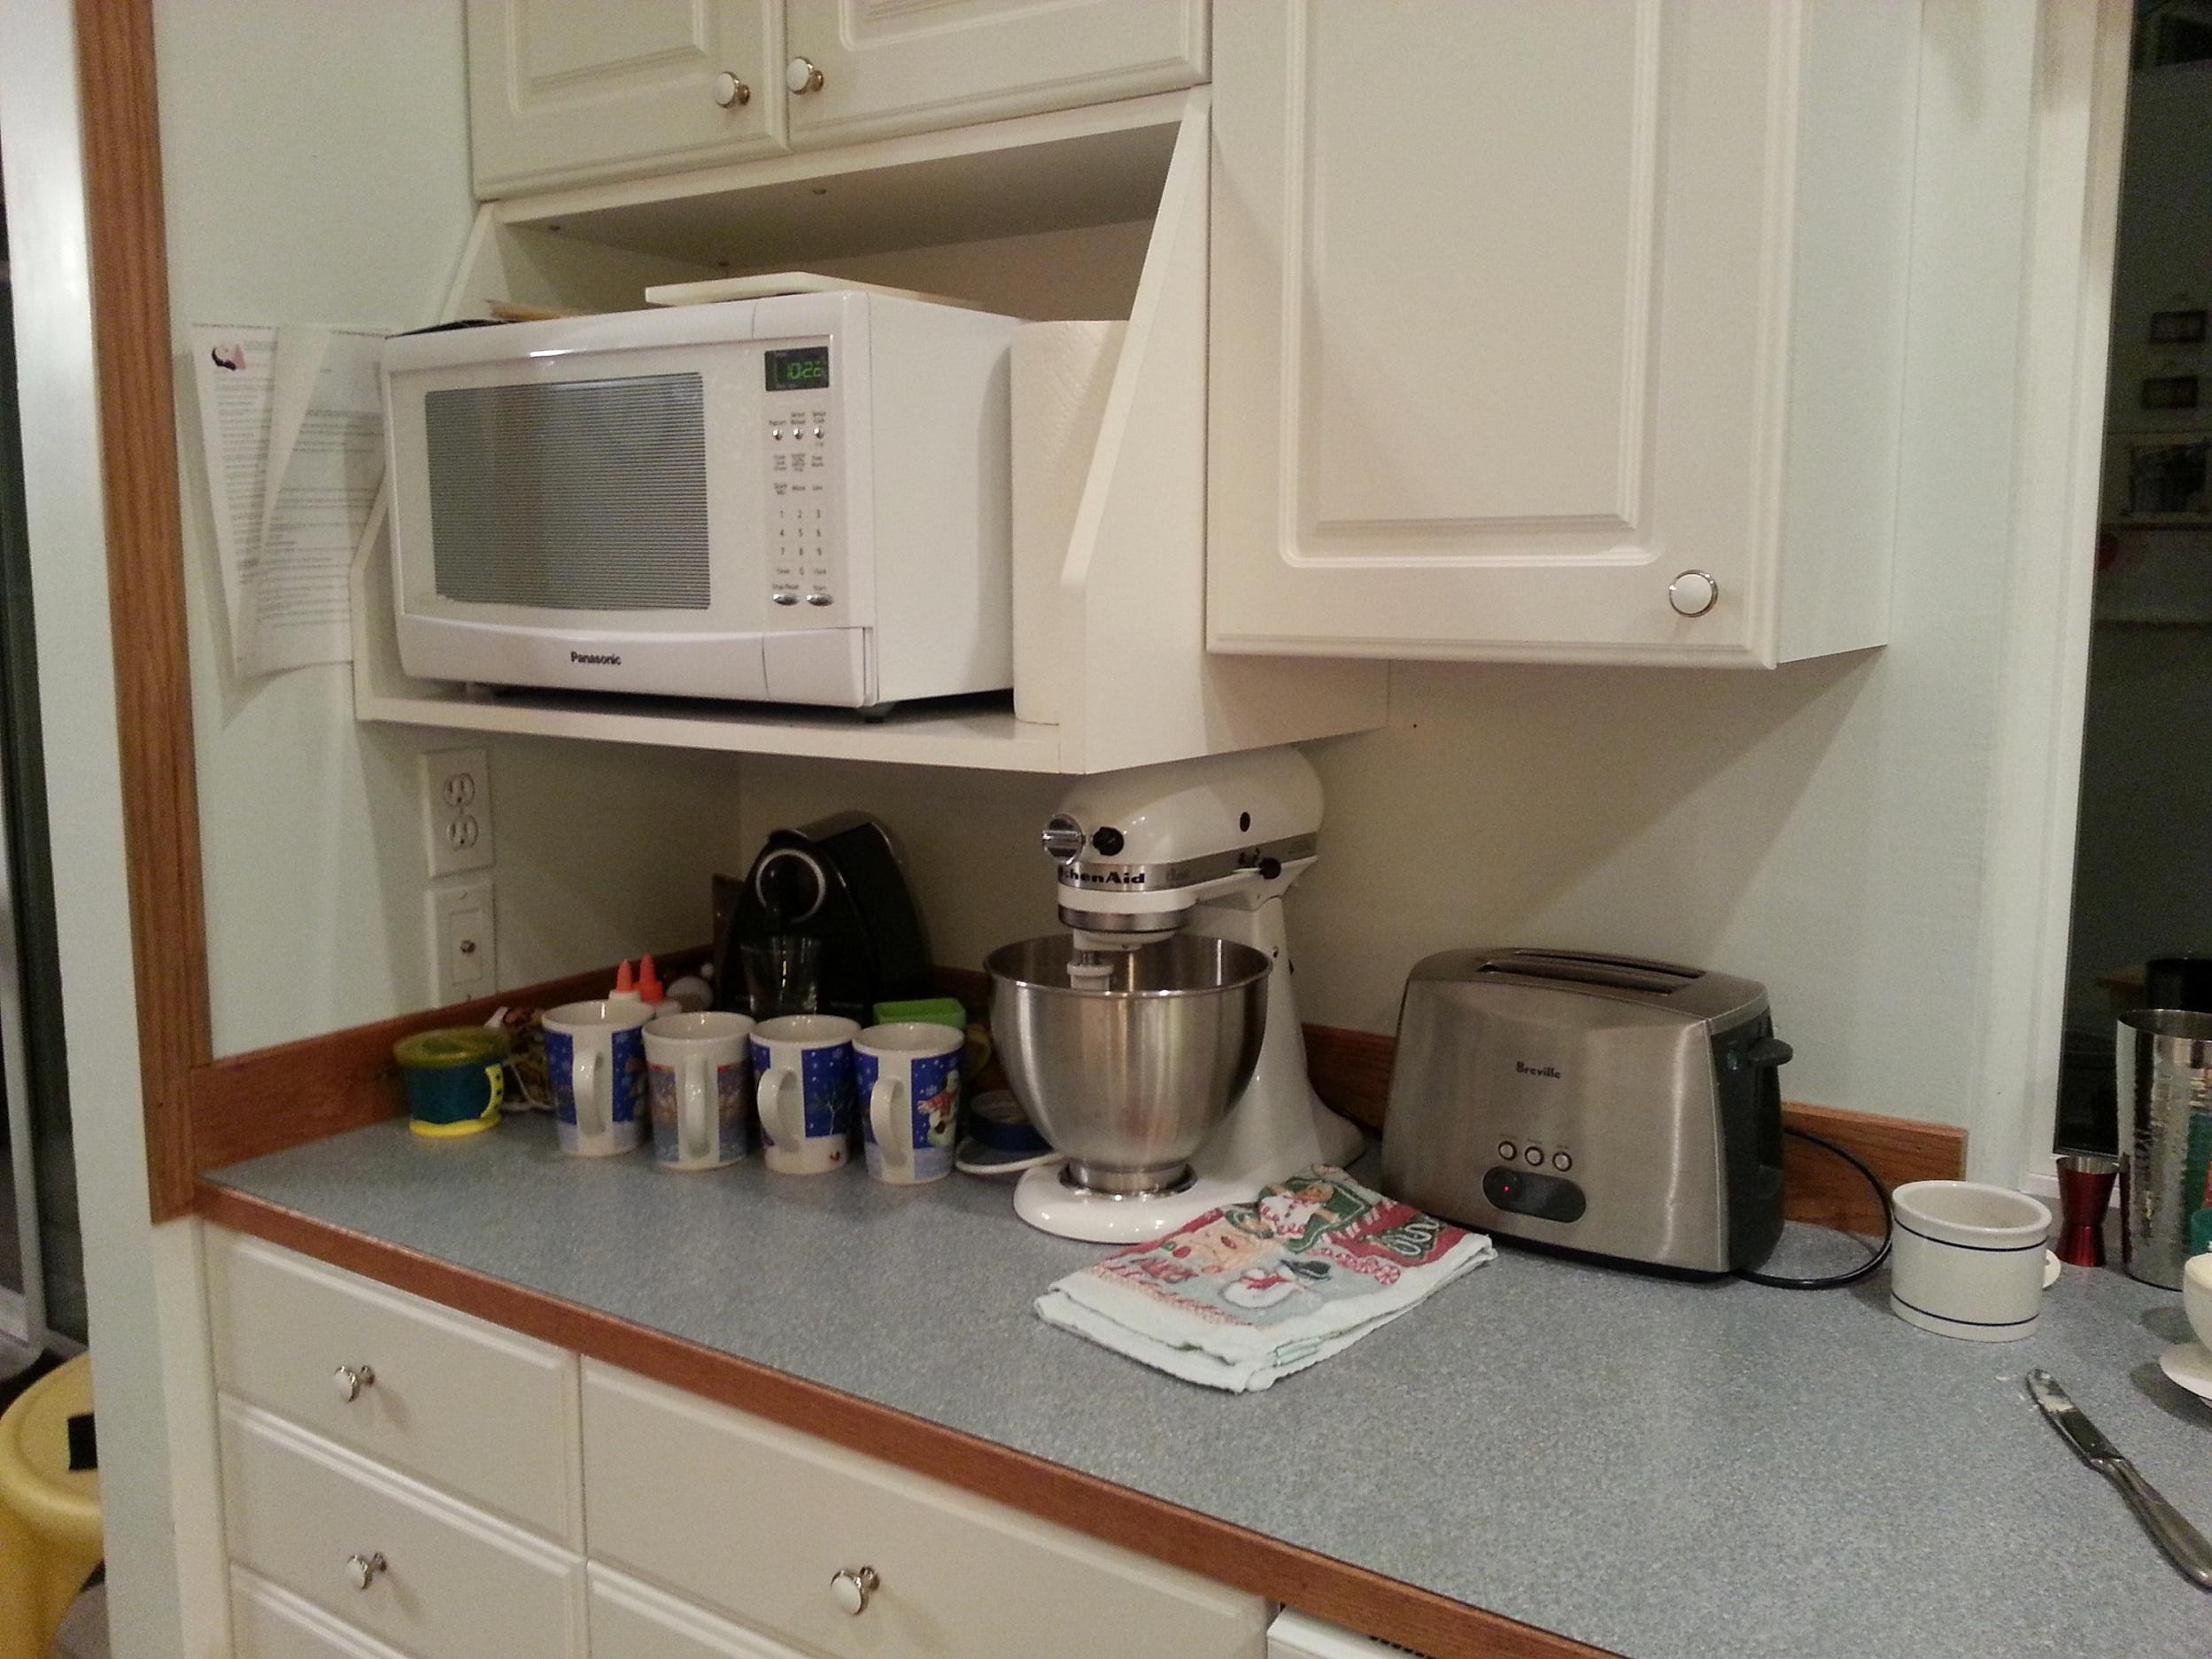 help me kitchen backsplash color countertop kitchen counters and backsplash Help me with kitchen backsplash color and countertop kitchen1